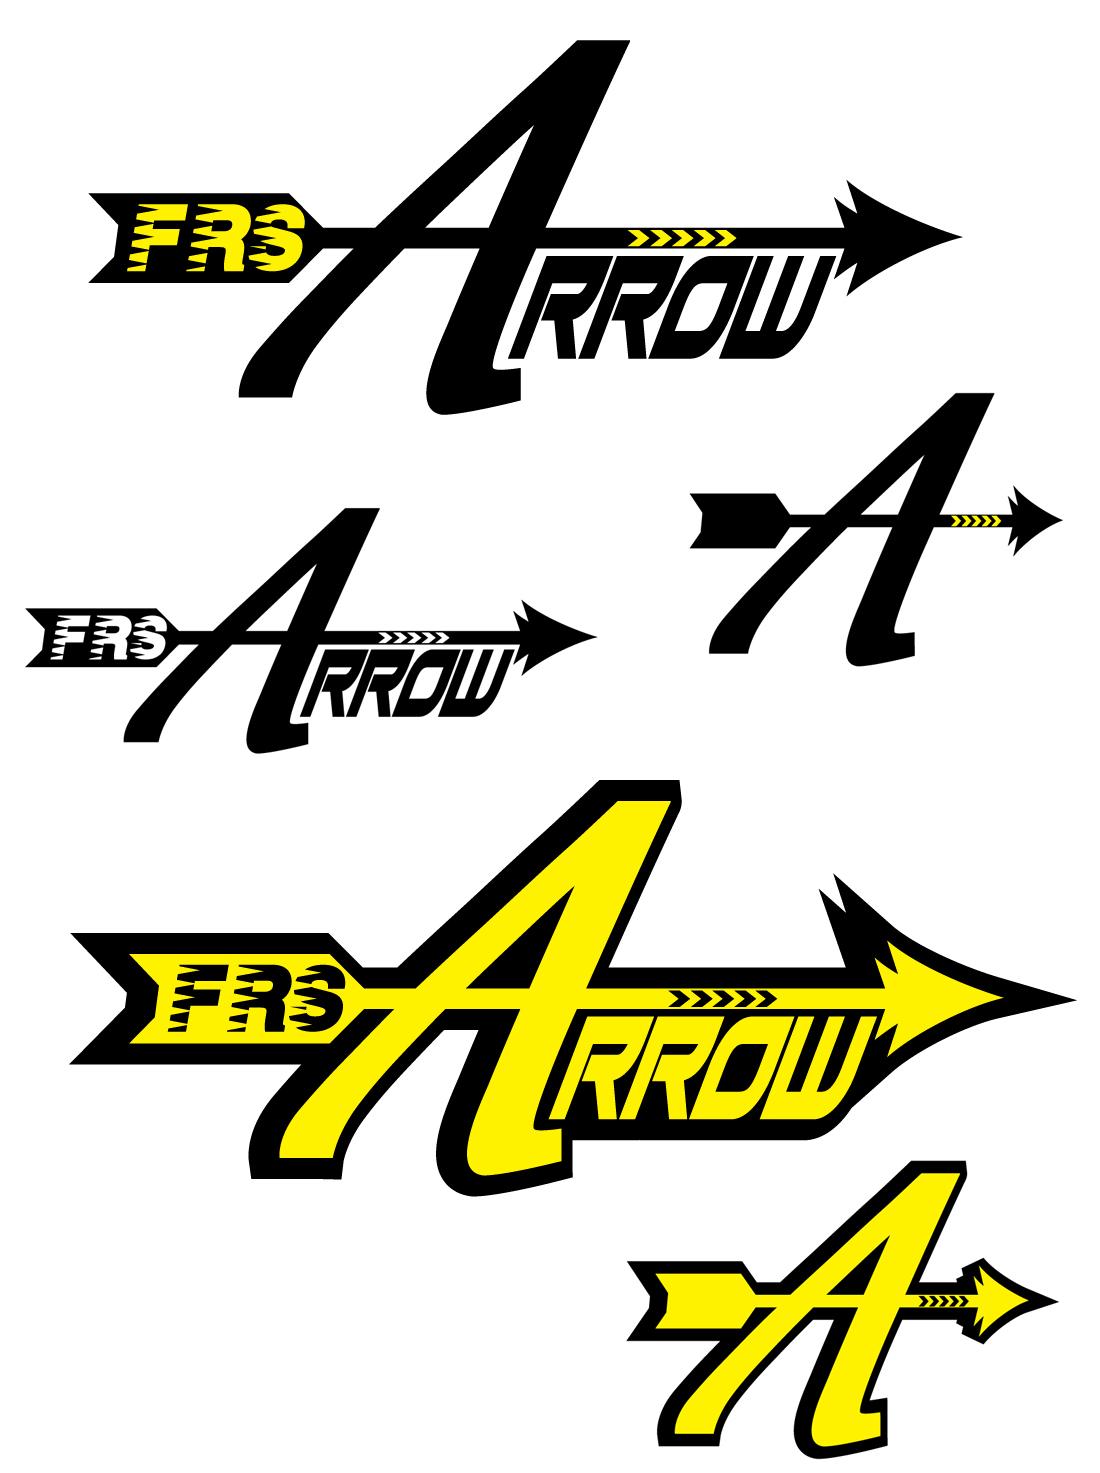 Logo Design by Planewalker - Entry No. 106 in the Logo Design Contest Fun Logo Design for FRS.